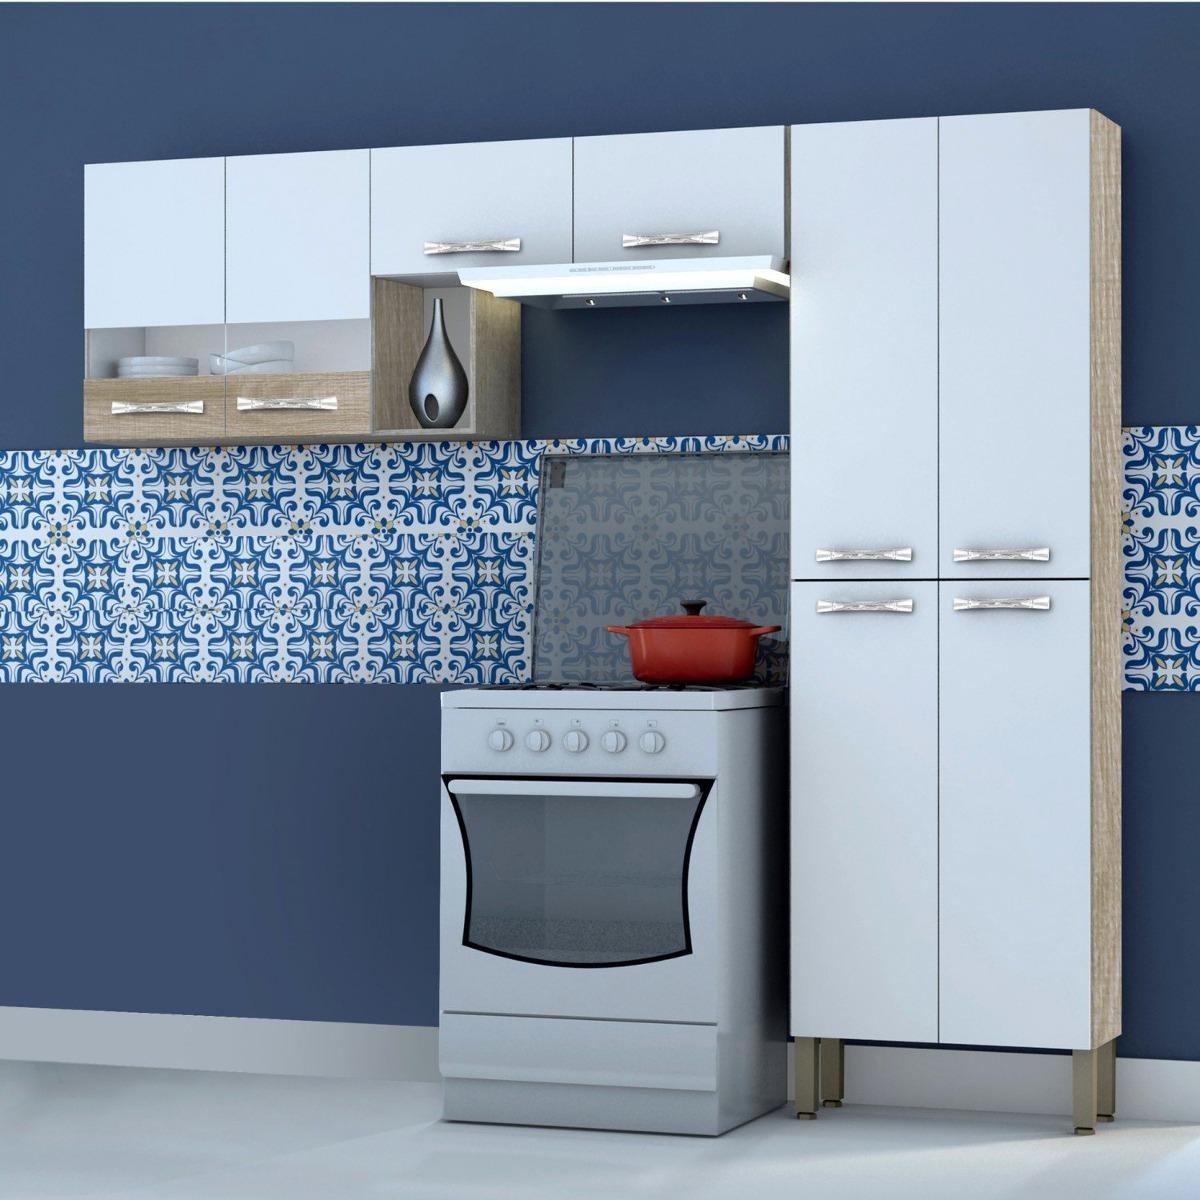 Cozinha Compacta 3 Pe As Mega Kits Paran Gdwt R 345 50 Em